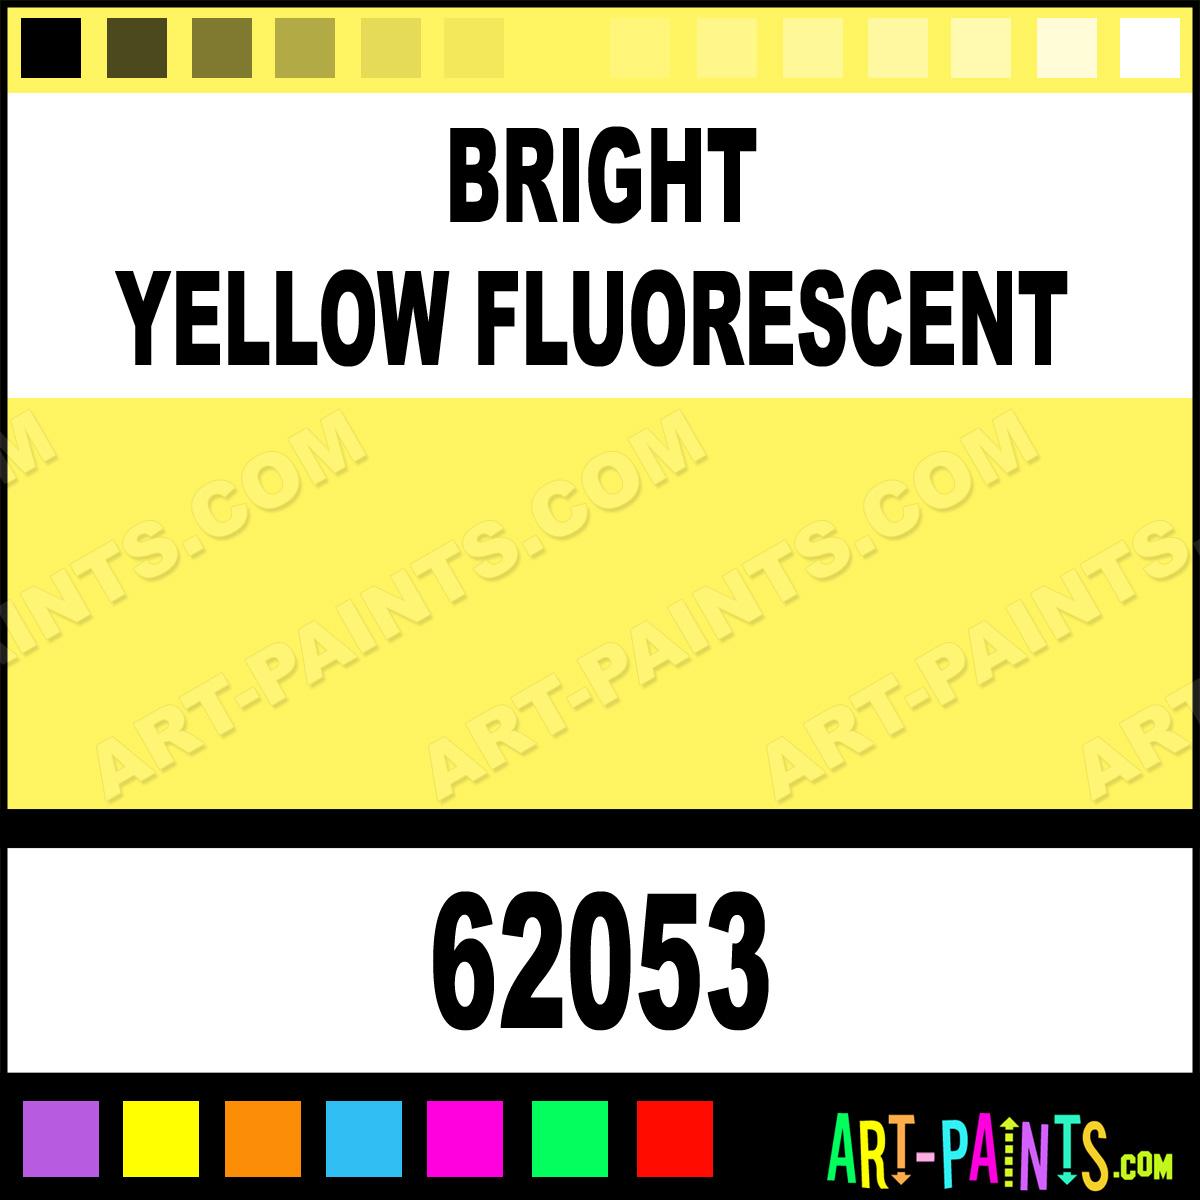 Bright Yellow Fluorescent Pro Color Airbrush Spray Paints 62053 Bright Yellow Fluorescent